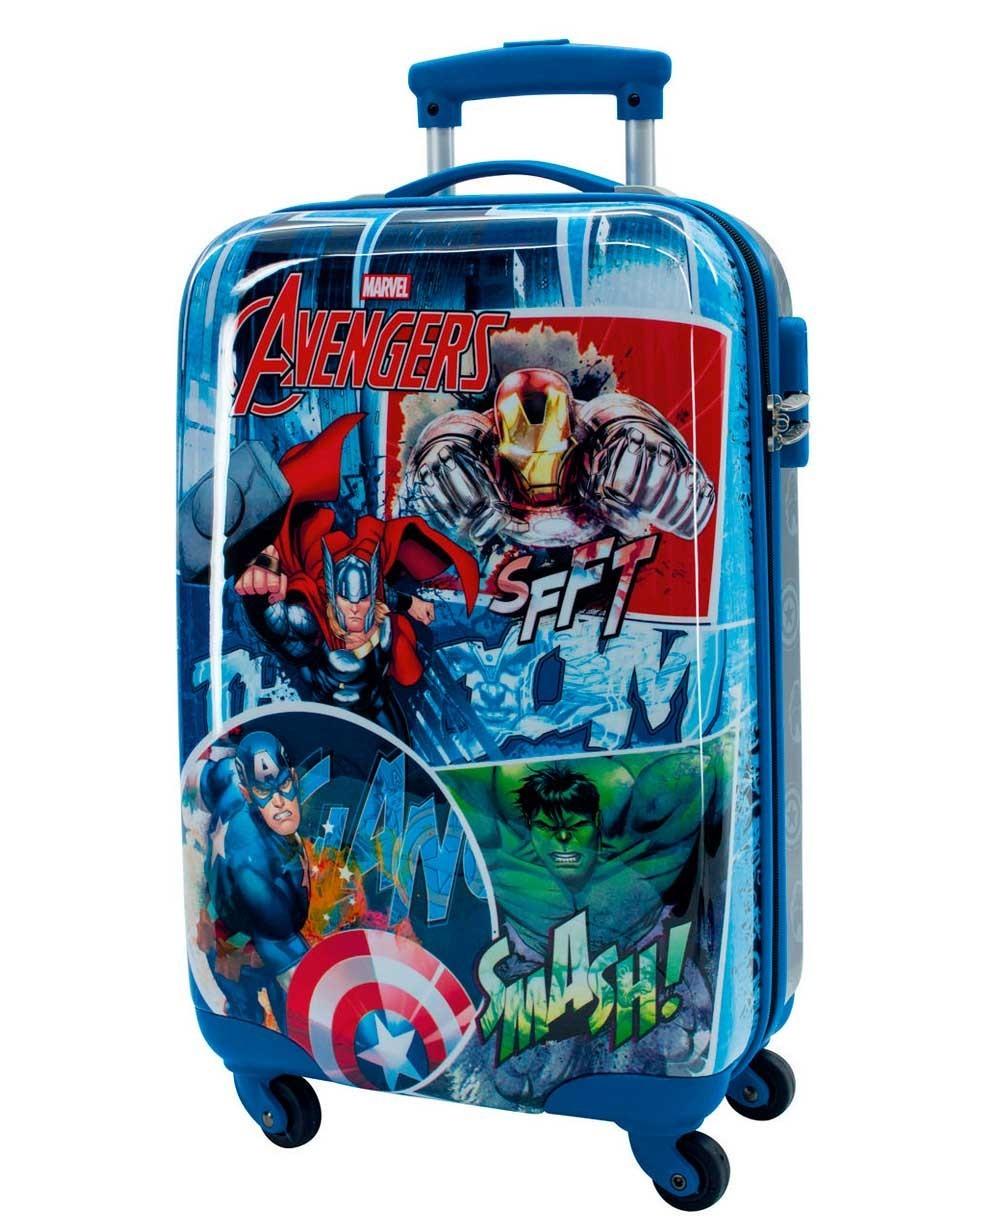 Marvel Avengers Street Maleta de mano Azul (Foto )